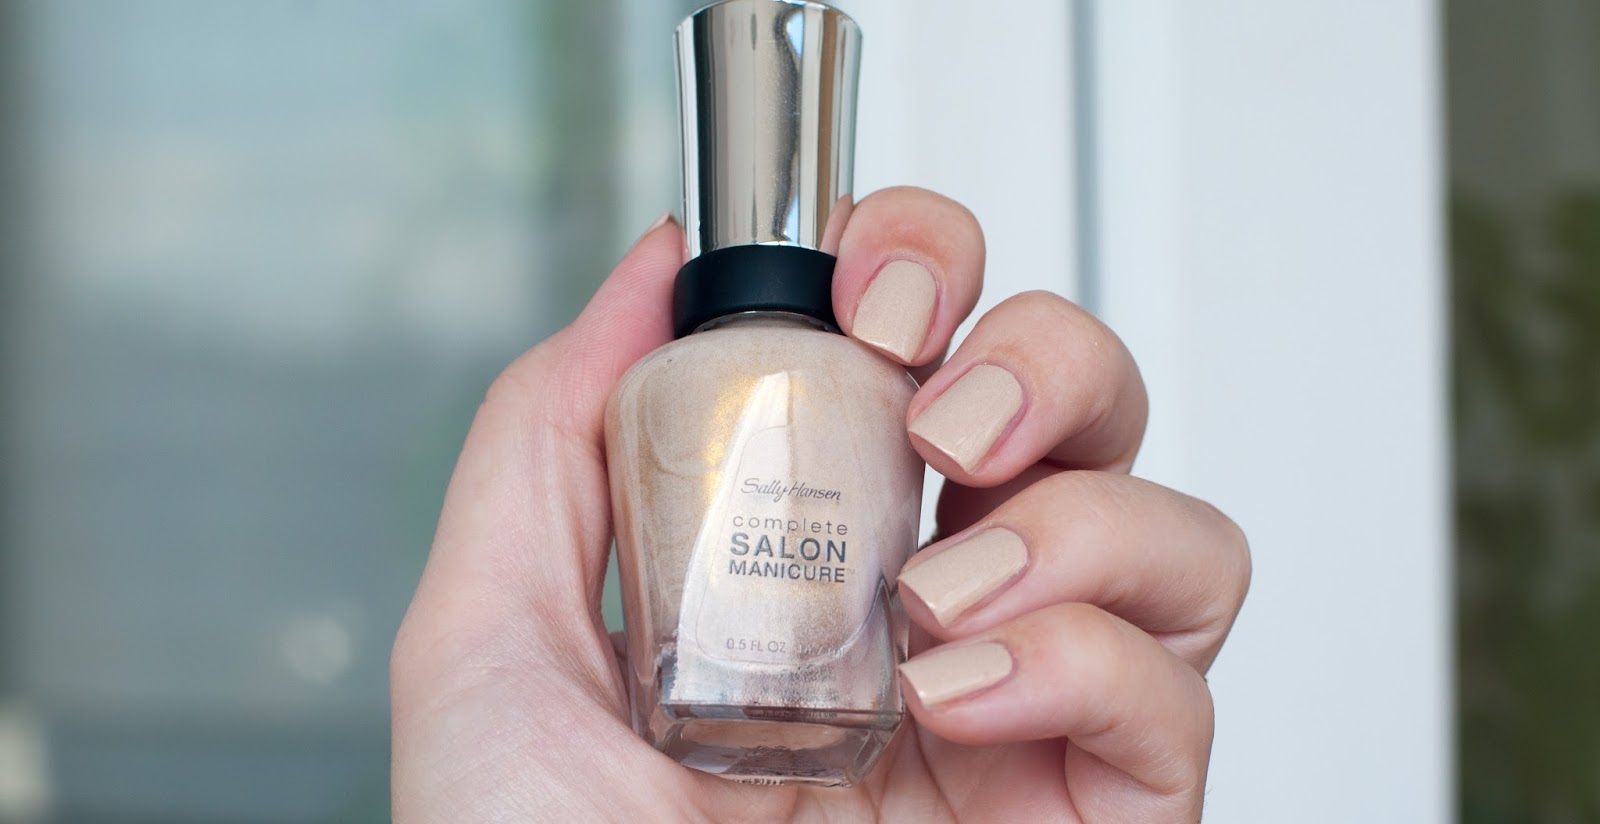 Лак для ногтей salon manicure sally hansen